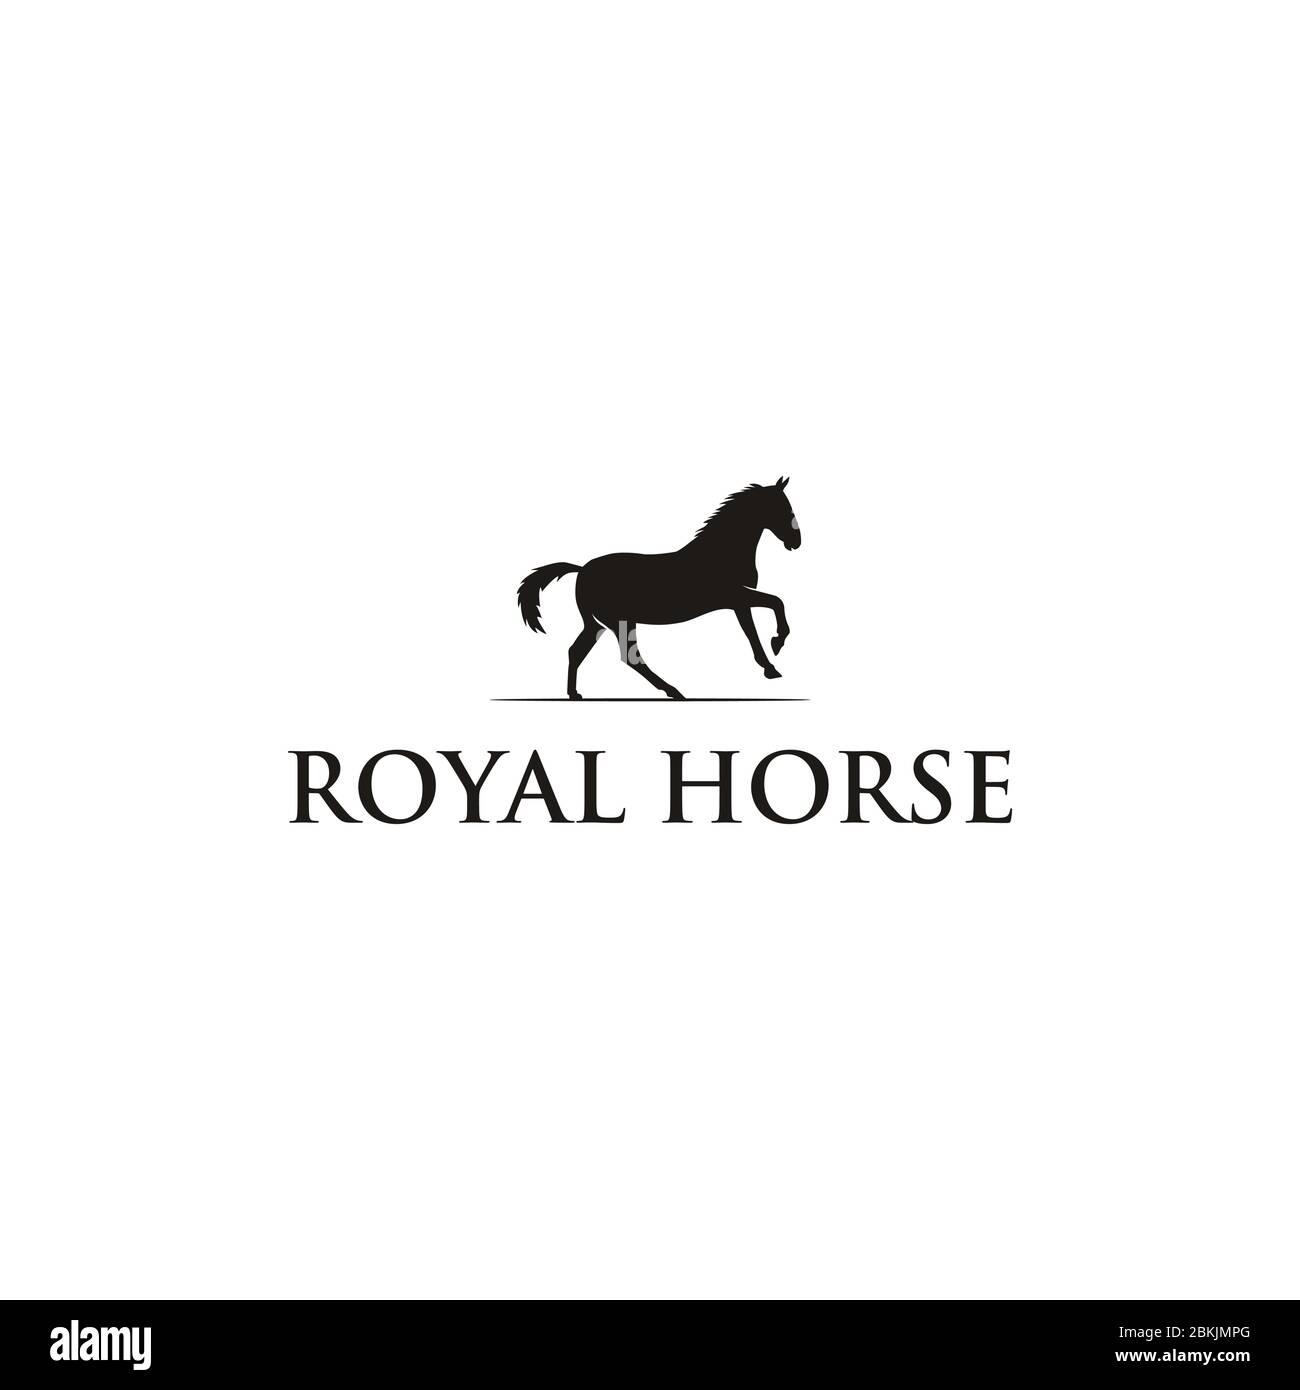 Horseback Knight Silhouette Horse Warrior Paladin Medieval Logo Design Stock Vector Image Art Alamy